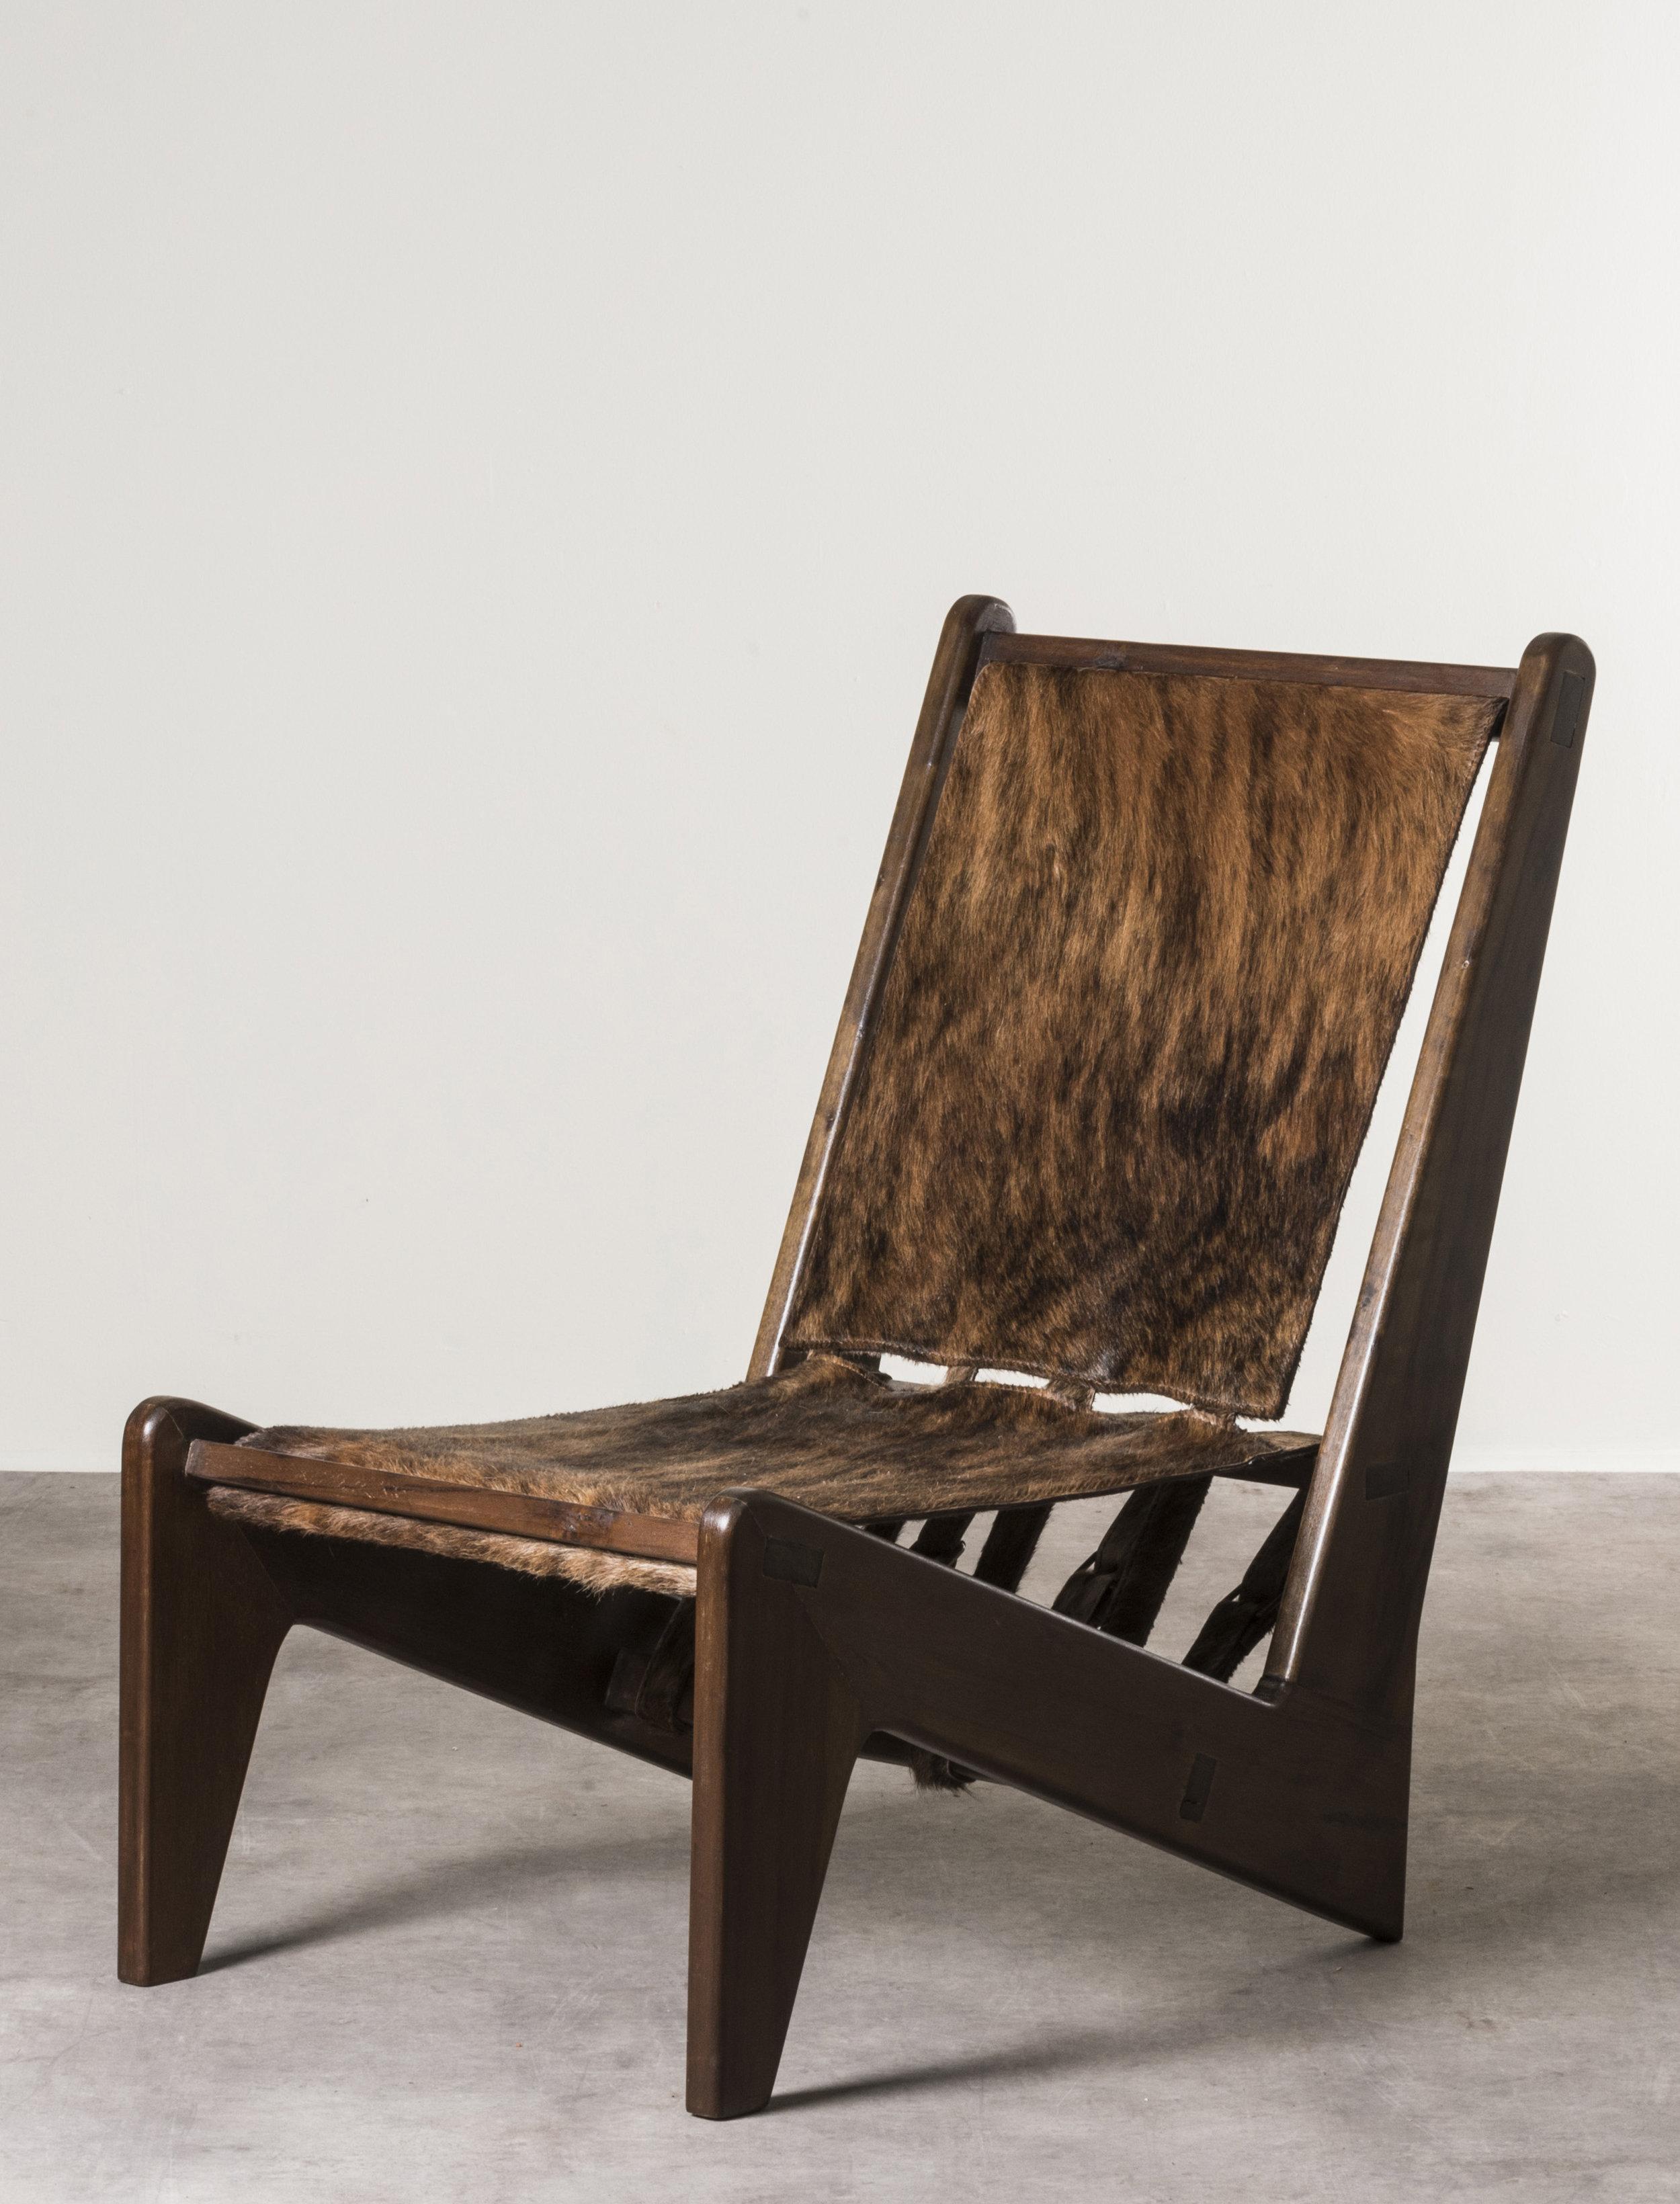 Zig Zag  armchairs, Brazil 1949 - 50, on display at Nilufar stand, Design Miami 2018  Design: Giancarlo Palanti Manufactured by Estúdio de Arte palma, LBB and Palanti, Sāo Paulo Cabreuva wood, Cavallino leather upholstery Size: 55,4 x 90 x h 81,5 cm / 21,8 x 35,4 x h 32,1 in  ⓒ Nilufar Gallery